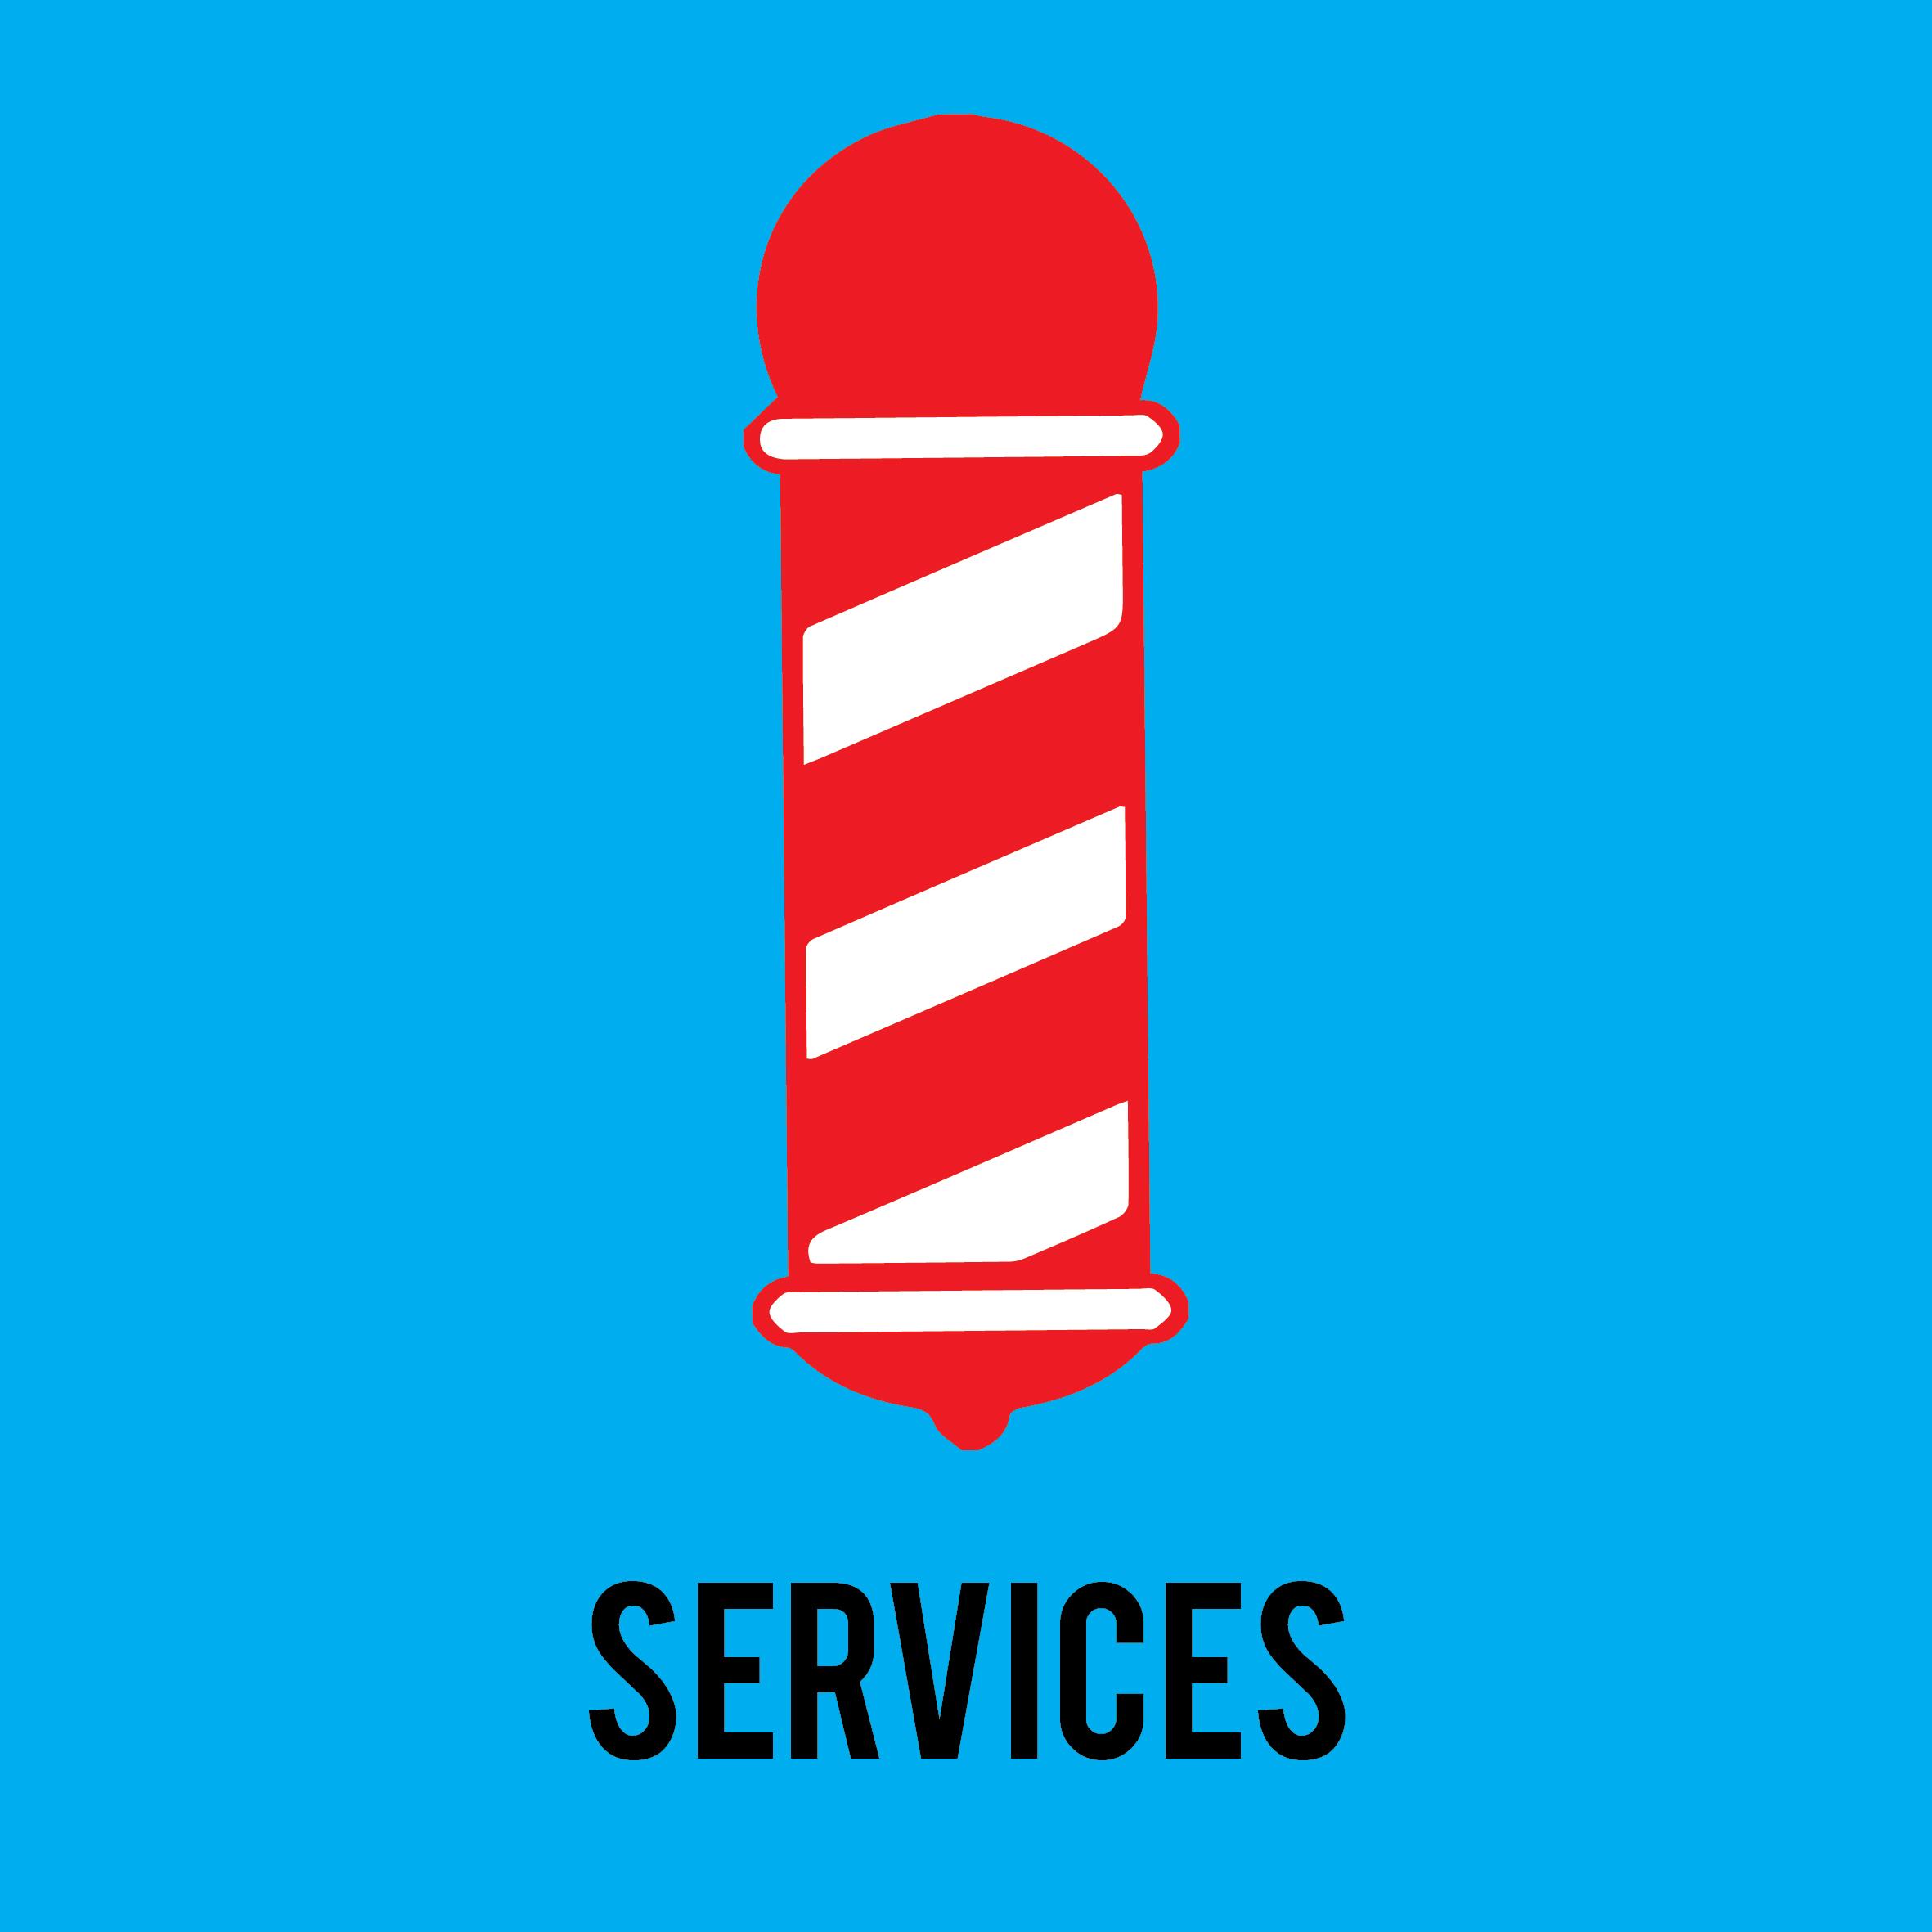 Services.jpeg